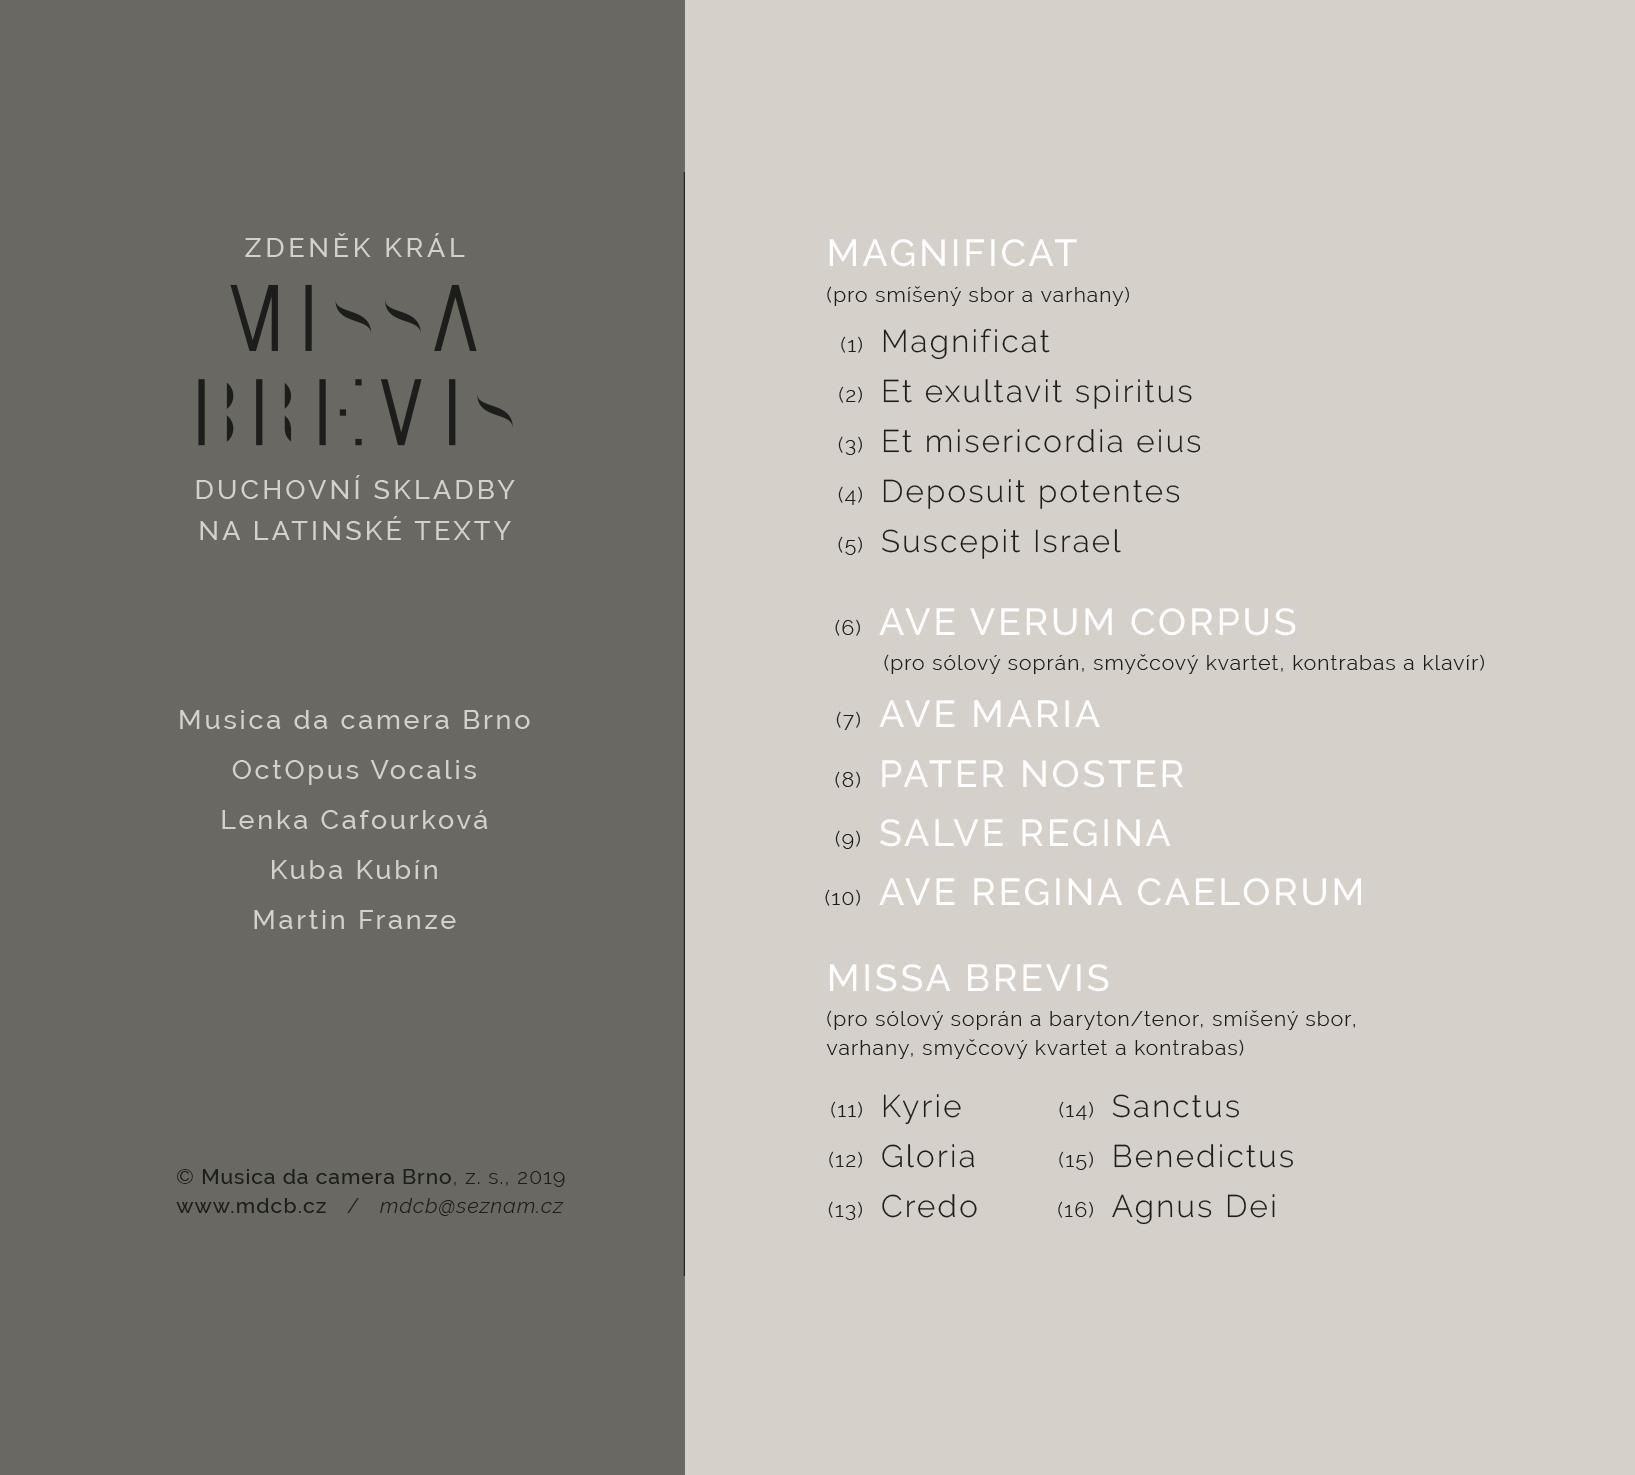 CD MISSA BREVIS již v prodeji !!!